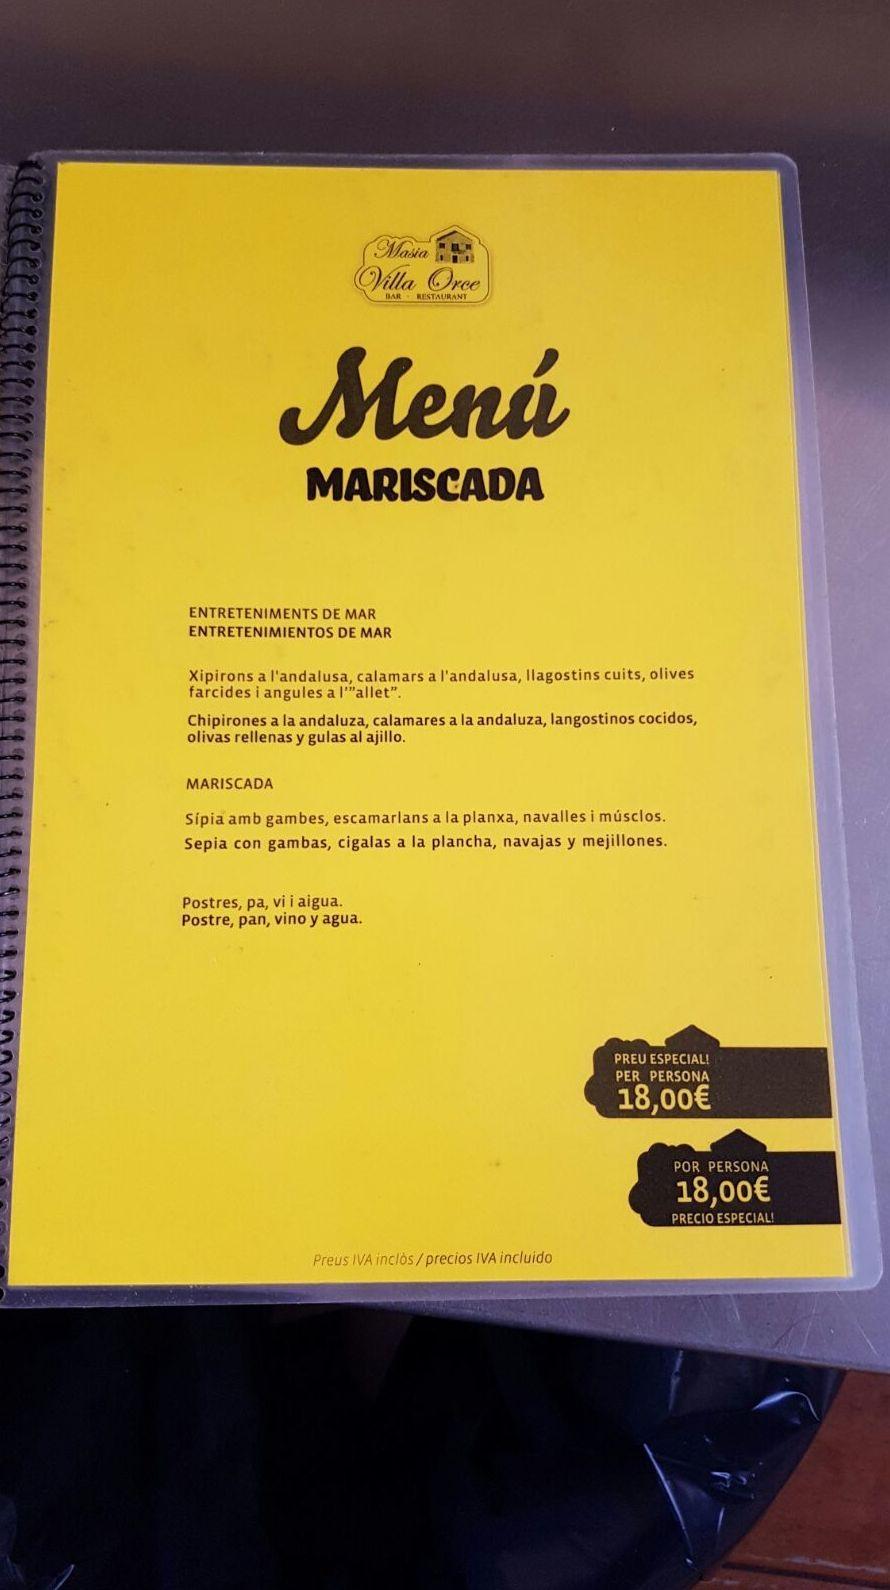 Menú Mariscada